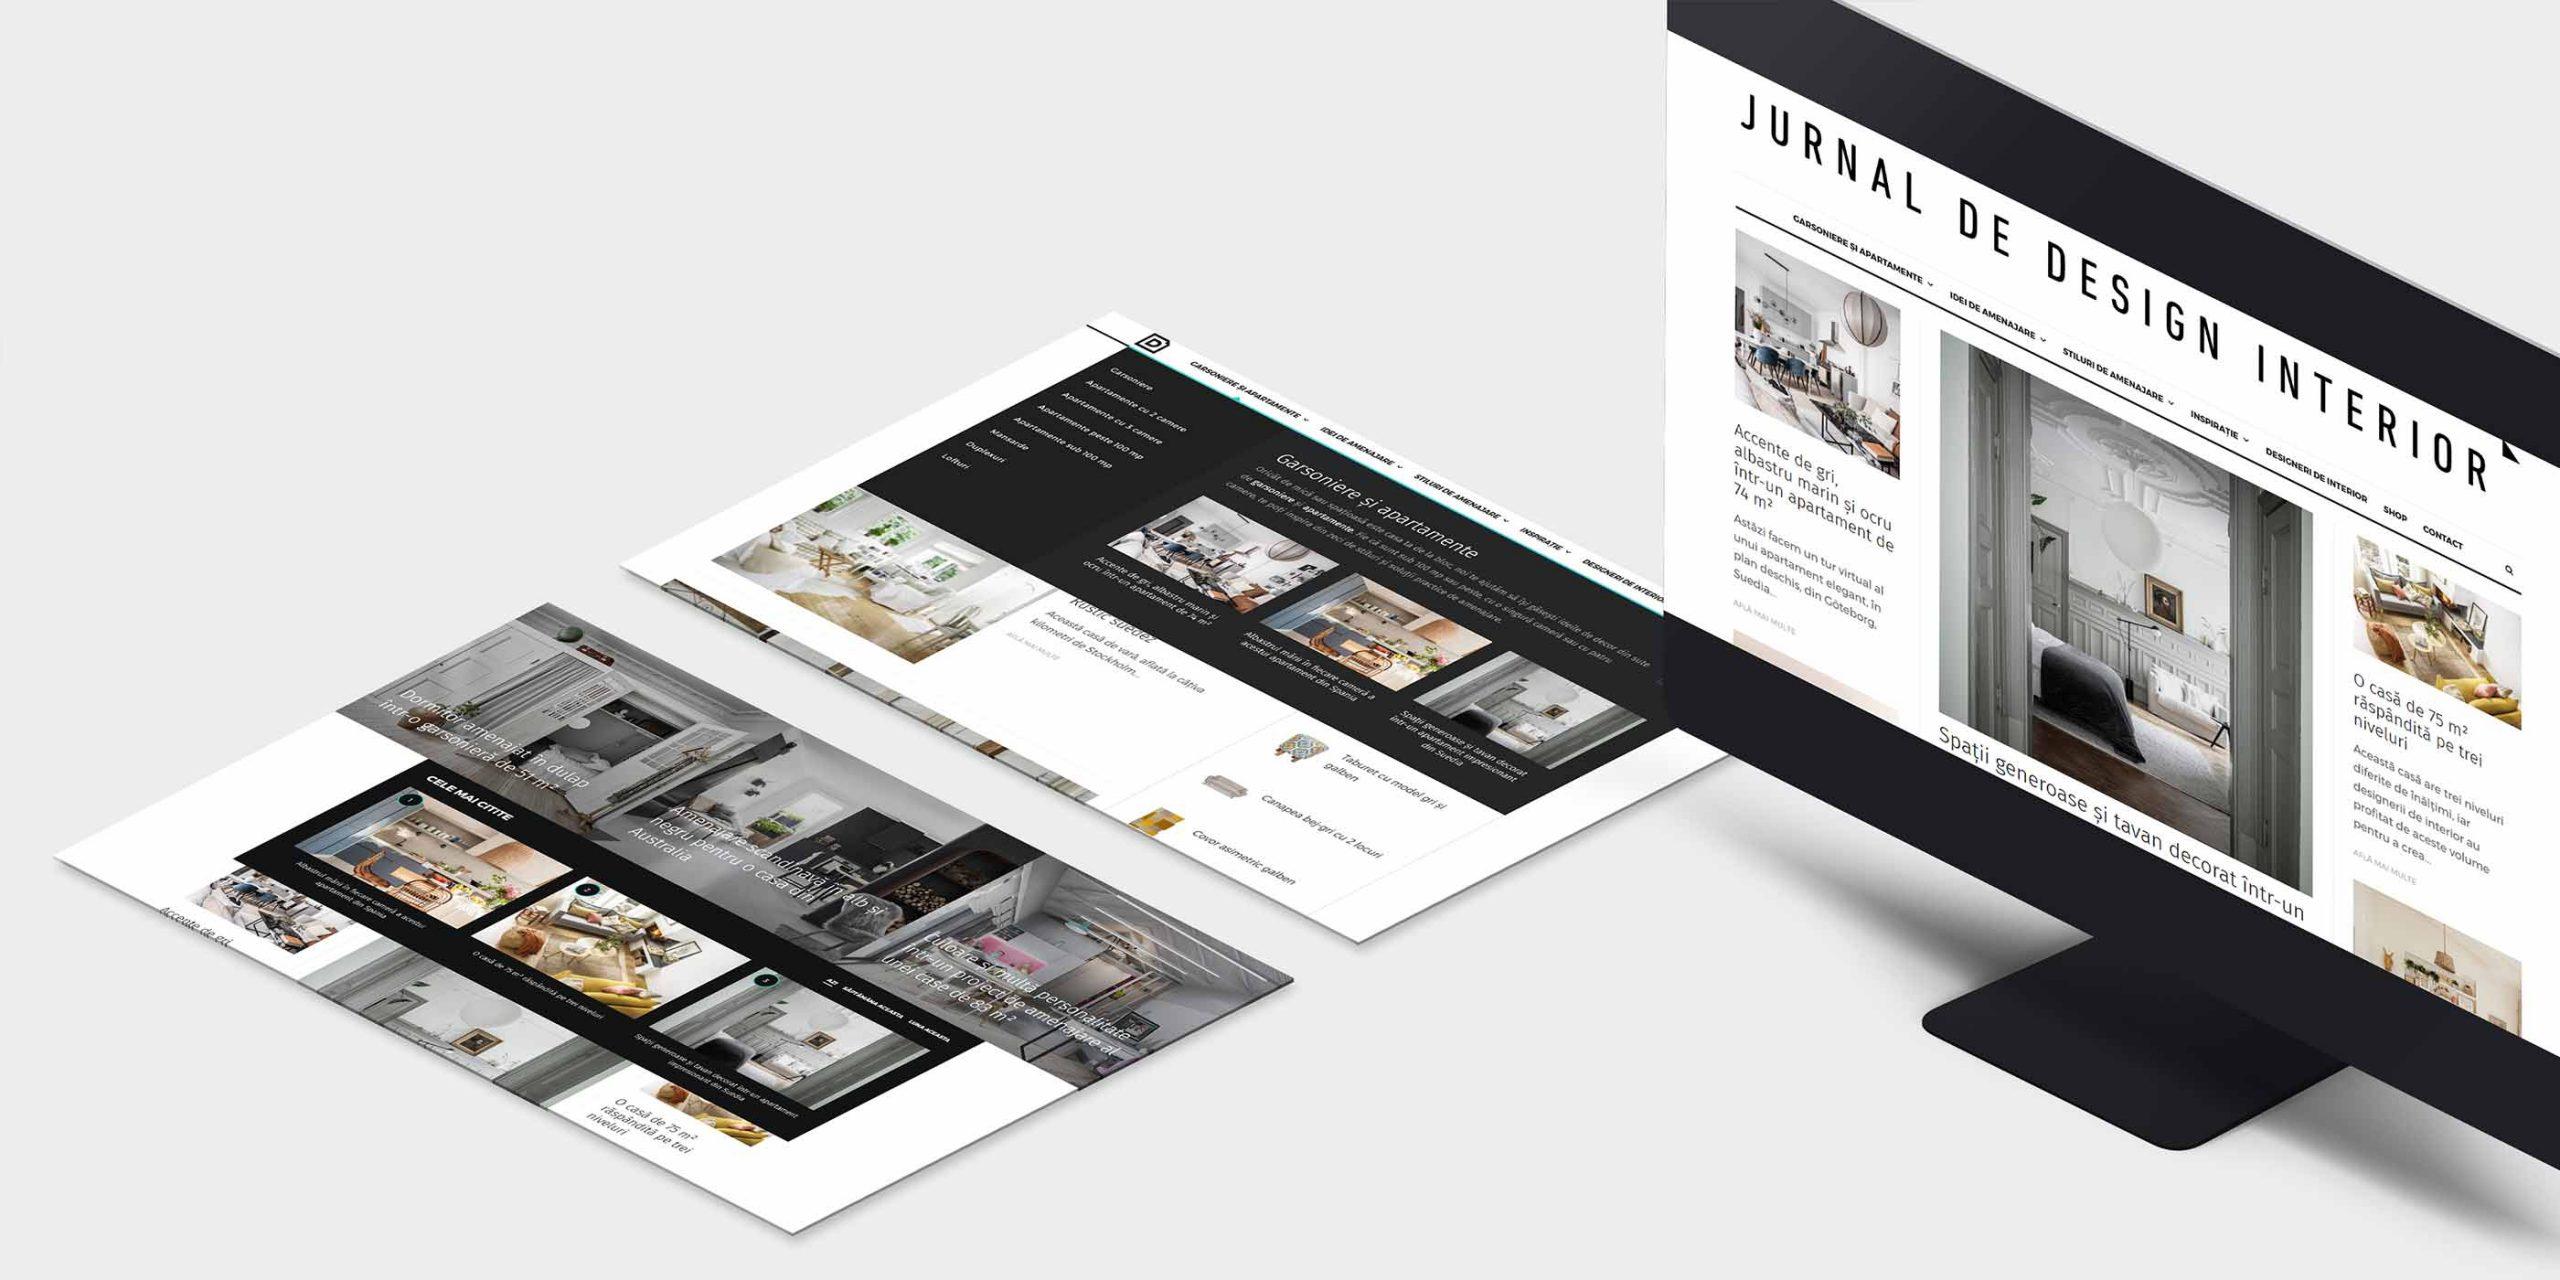 improspatare-brand-si-platforma-online-pentru-jurnal-de-design-interior